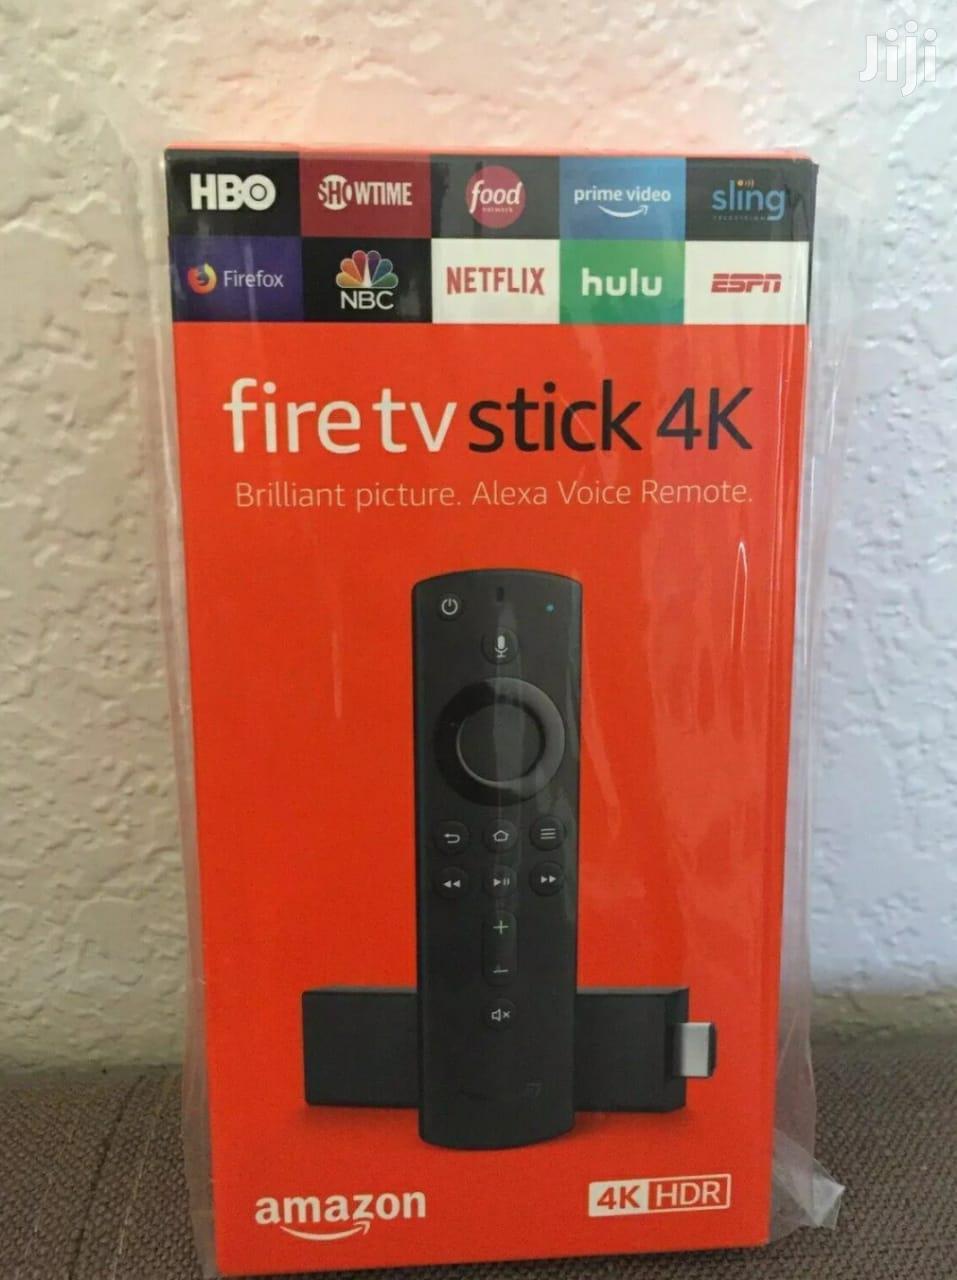 New Original Fire Tv Stick 4K Hdr Streaming Box 4k Videos